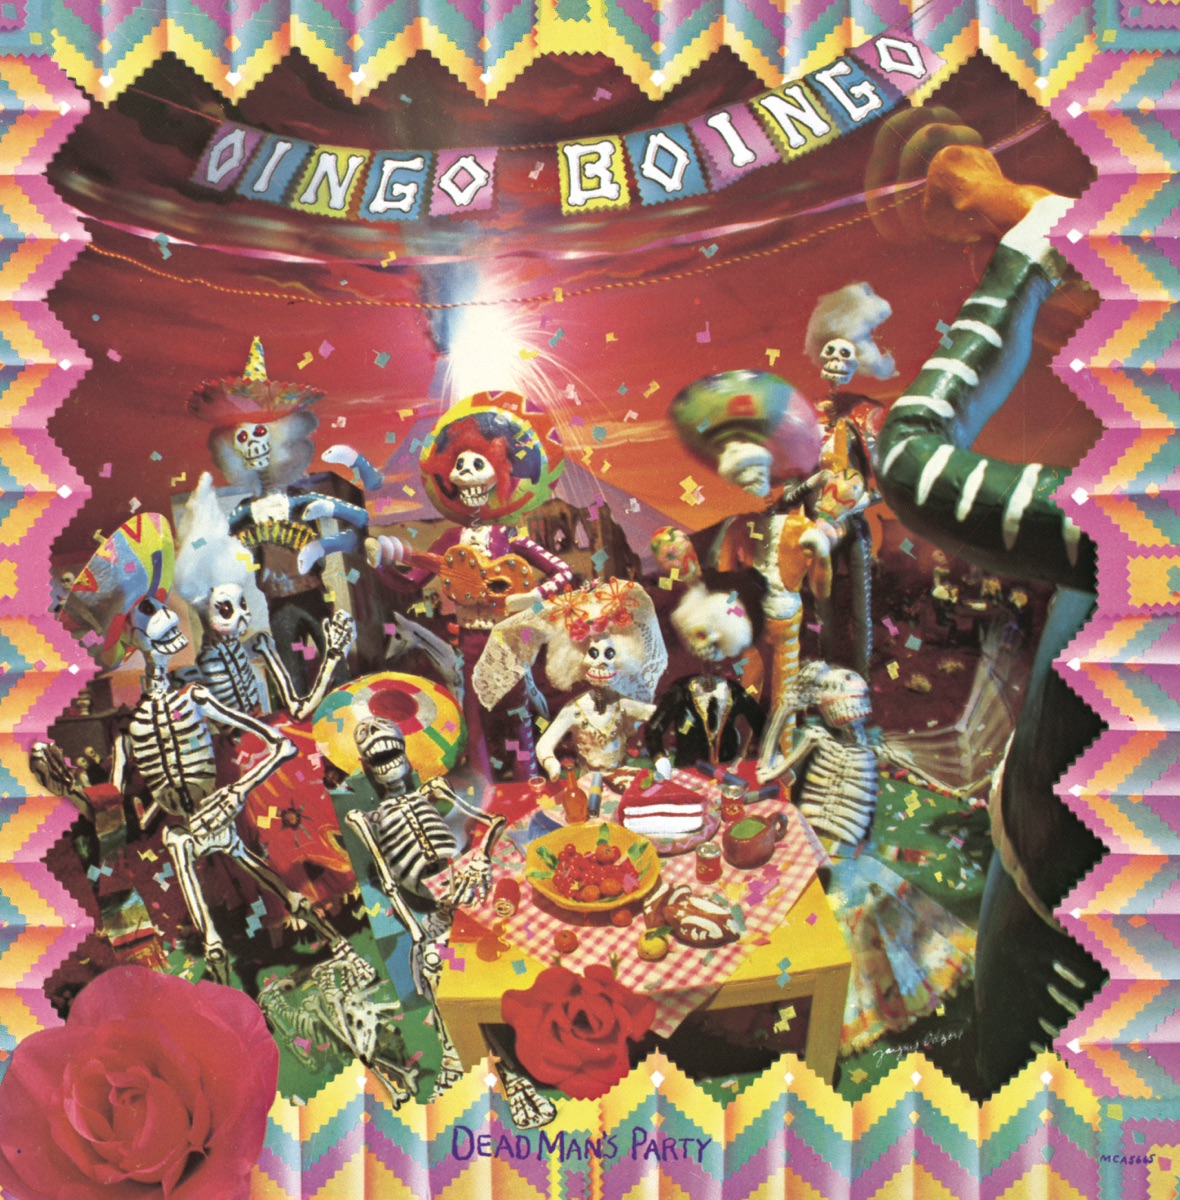 Dead Man S Party Album Cover By Oingo Boingo